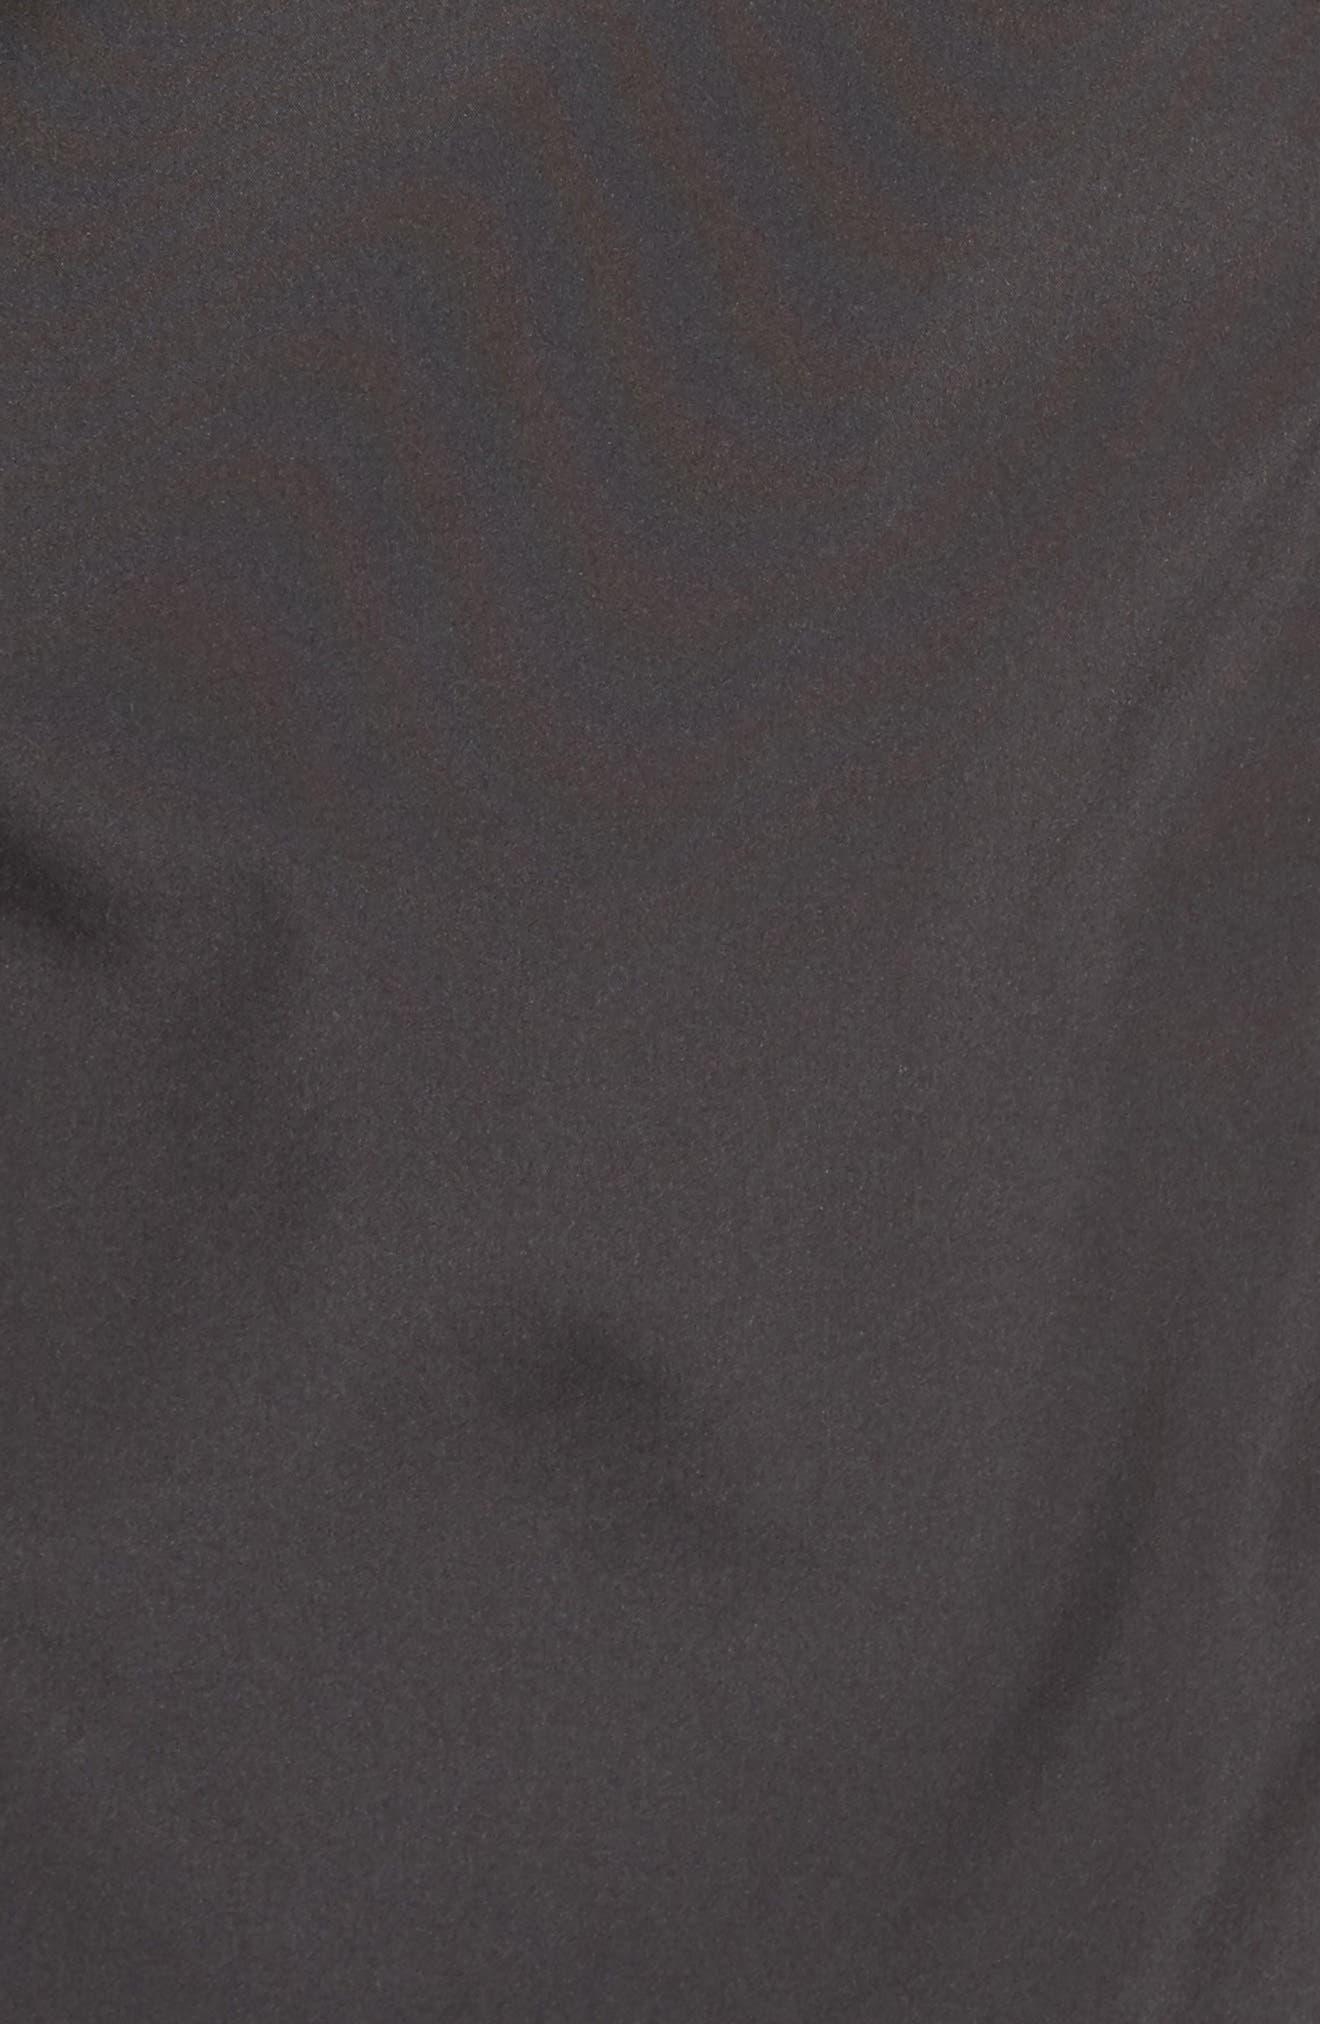 Storm Coat with Faux Fur Trim & Lining,                             Alternate thumbnail 6, color,                             001